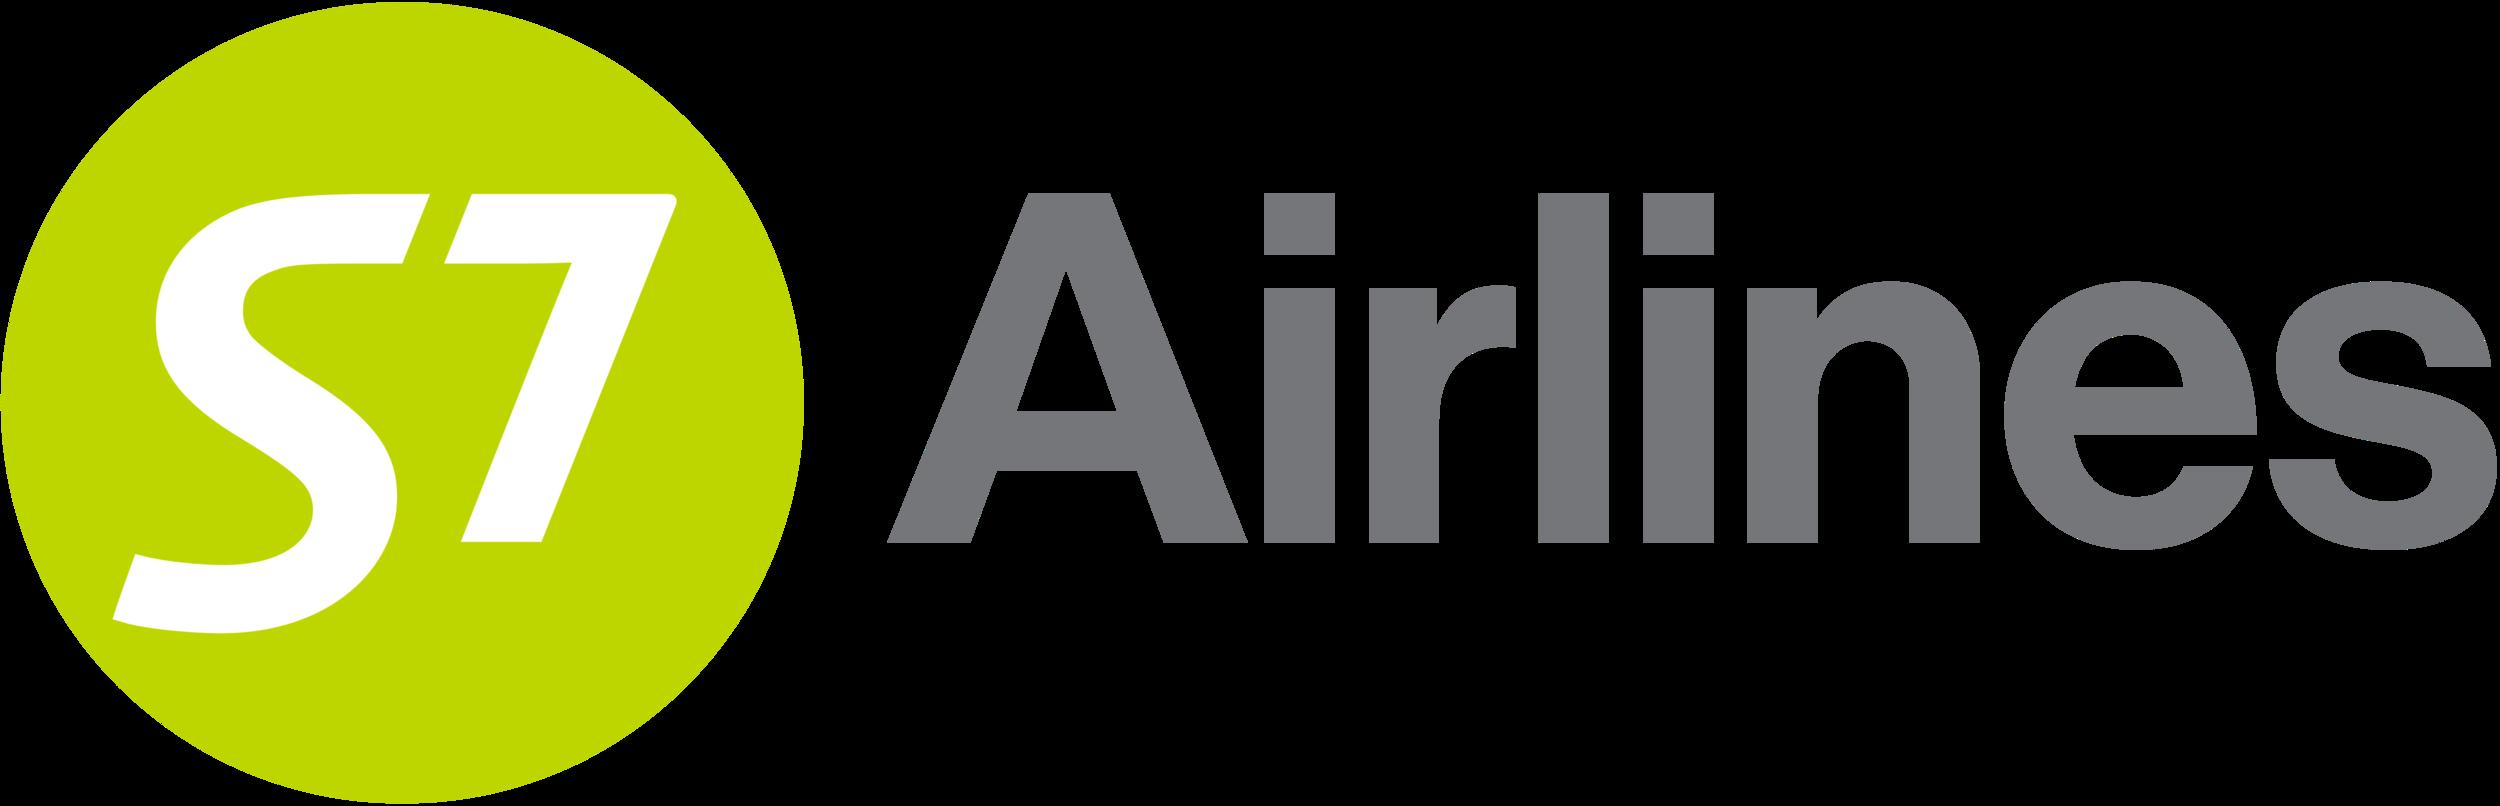 S7_Airlines_logo_logotype_emblem.png